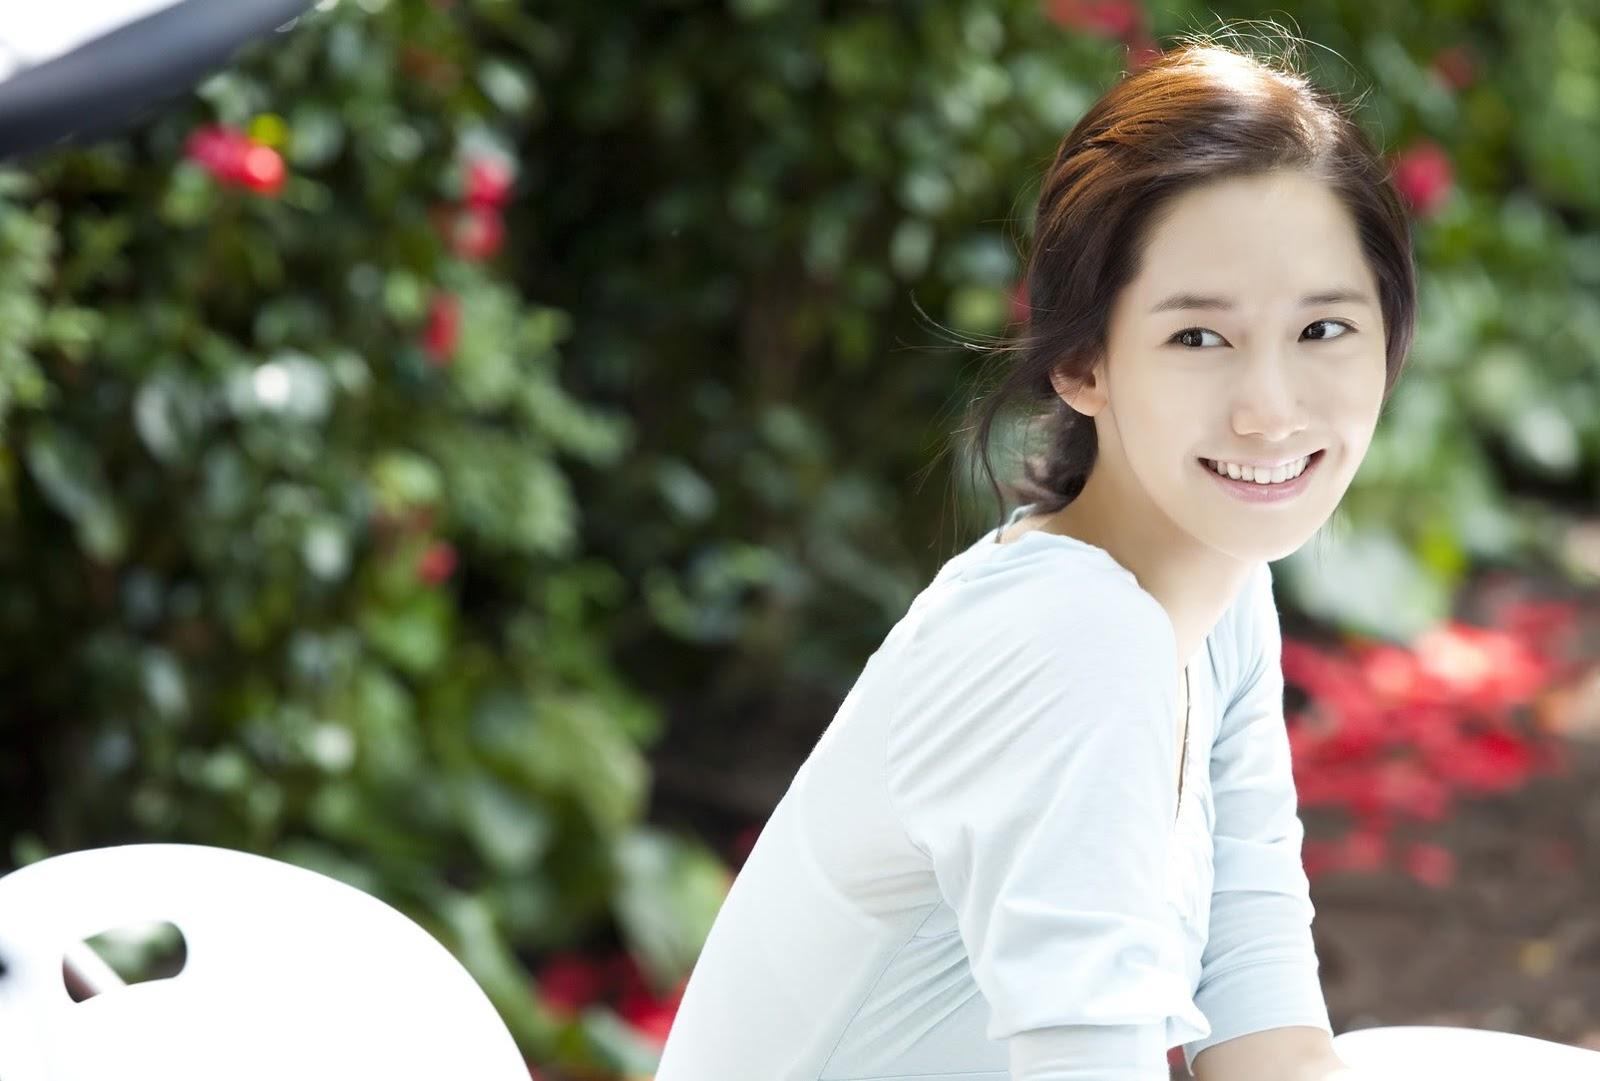 Yoona Wallpaper Hd 1600x1081